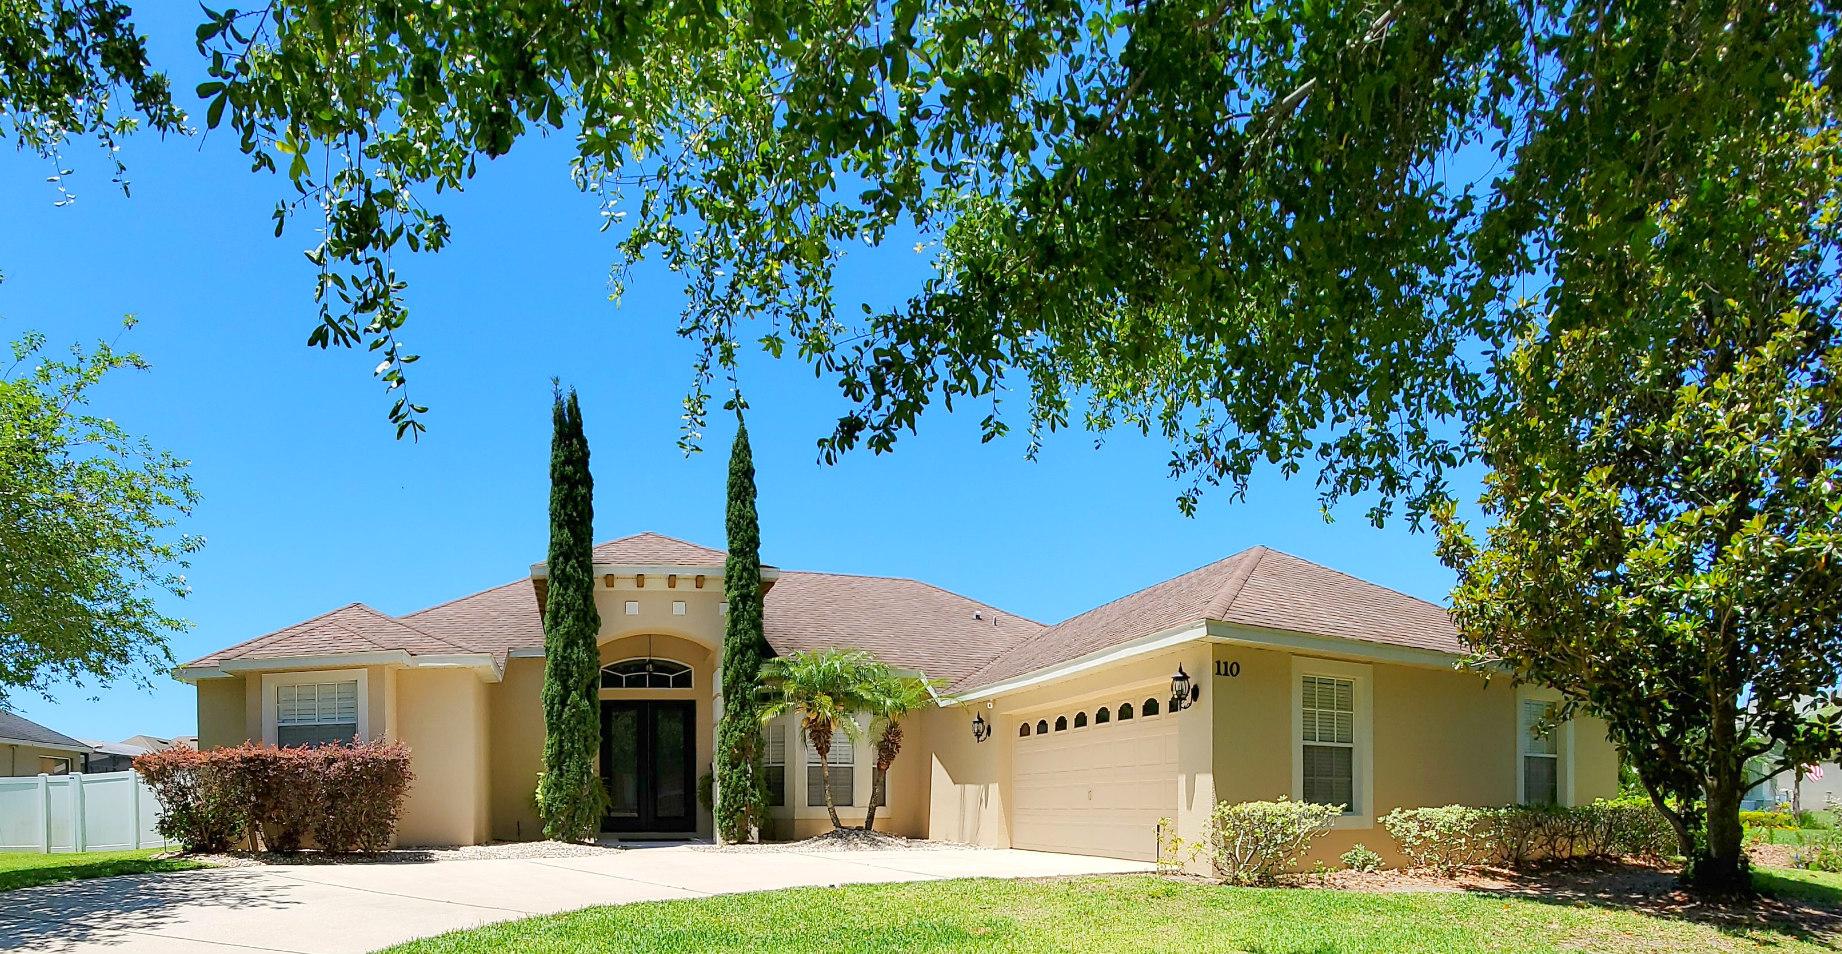 110 Onyx Court, Auburndale, FL 33823-8714